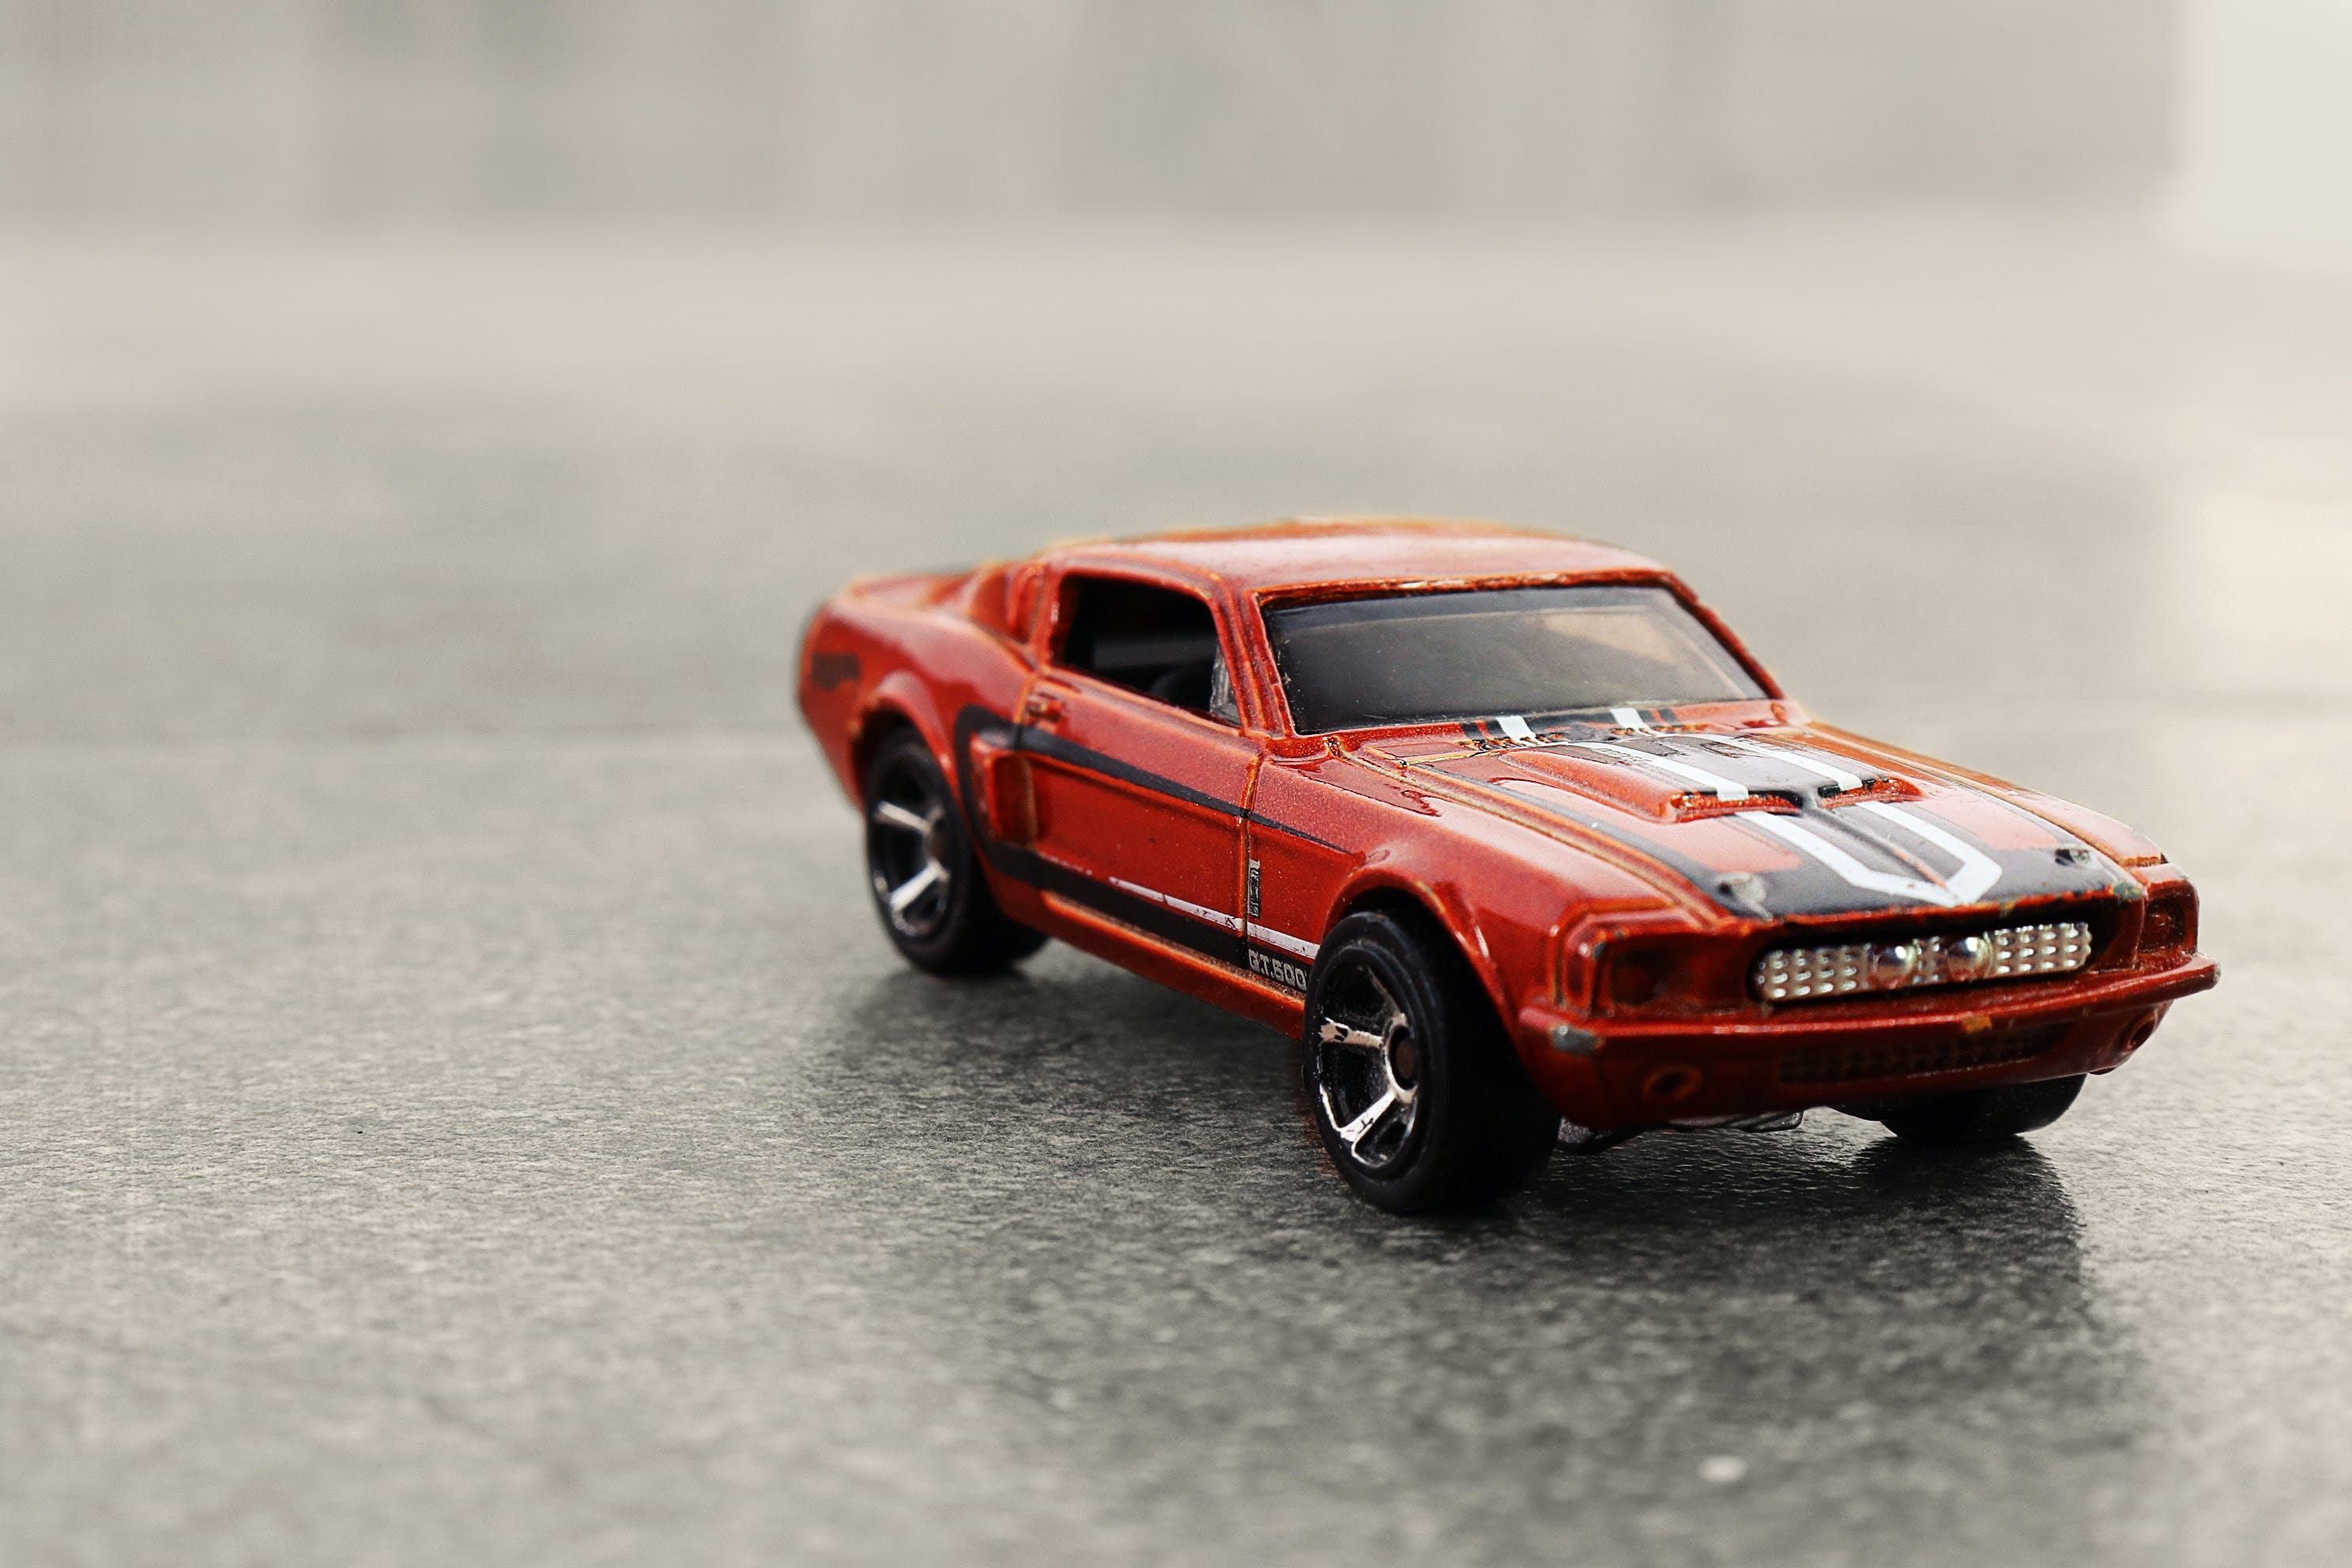 Free stock photo of car, desktop background, desktop wallpaper, gt500